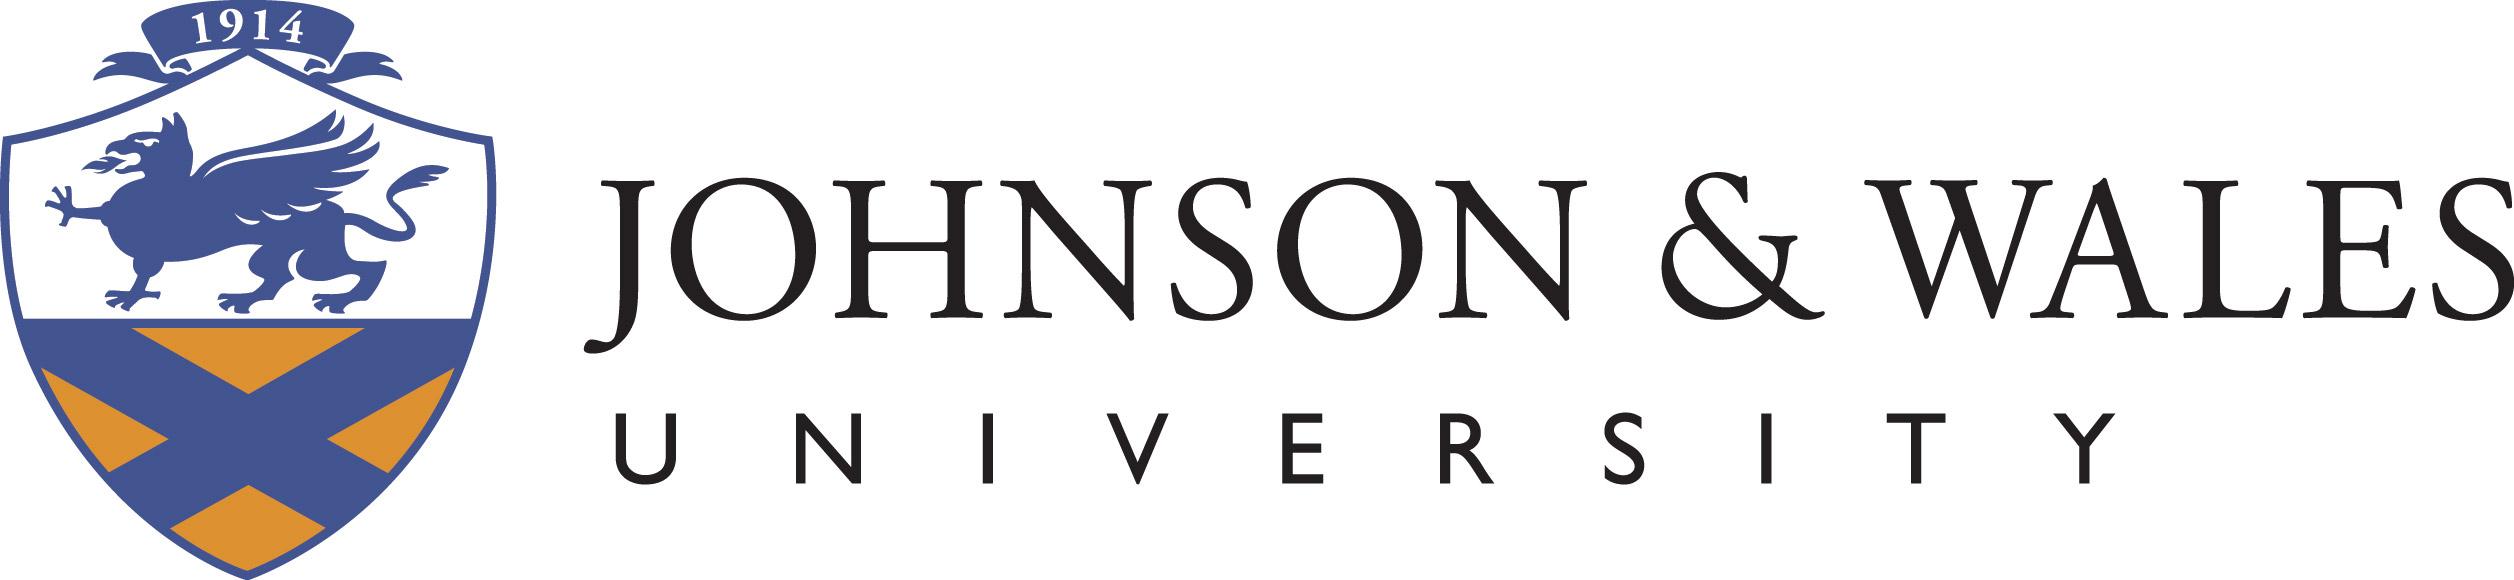 Johnson and Wales University